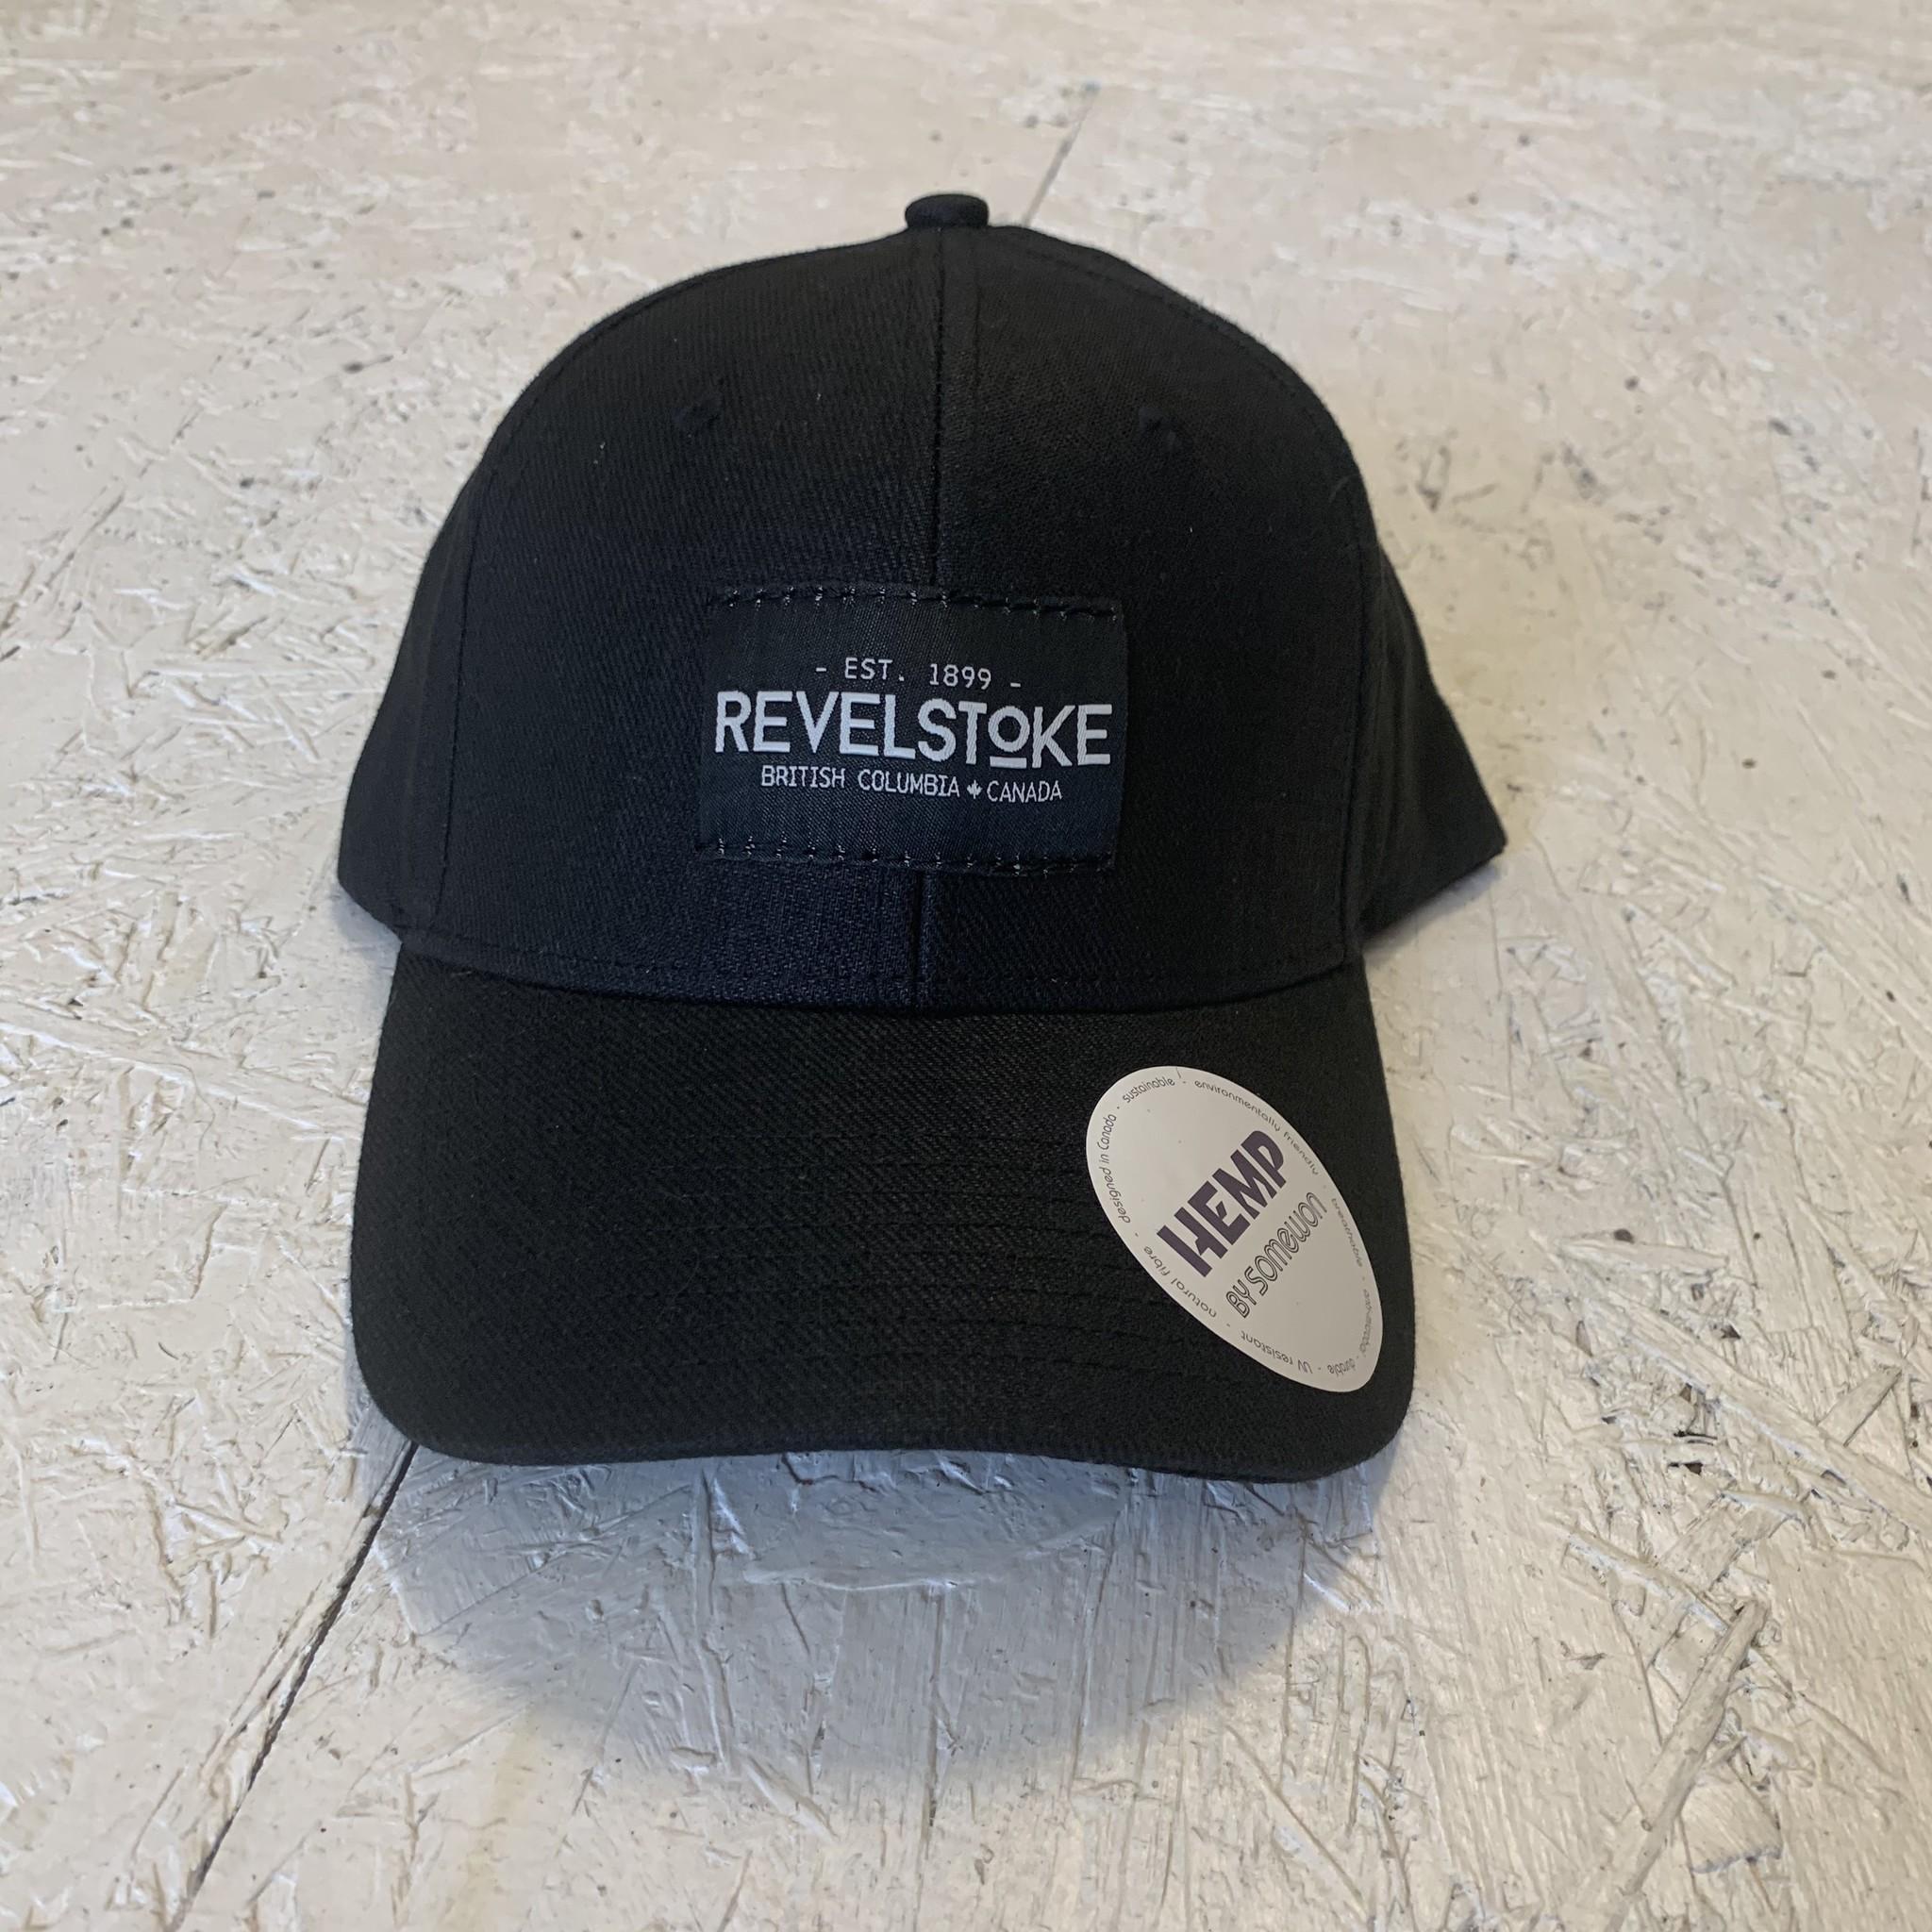 Revelstoke Trading Post Revelstoke - Trading Co Hemp Curve Brim Cap - Black